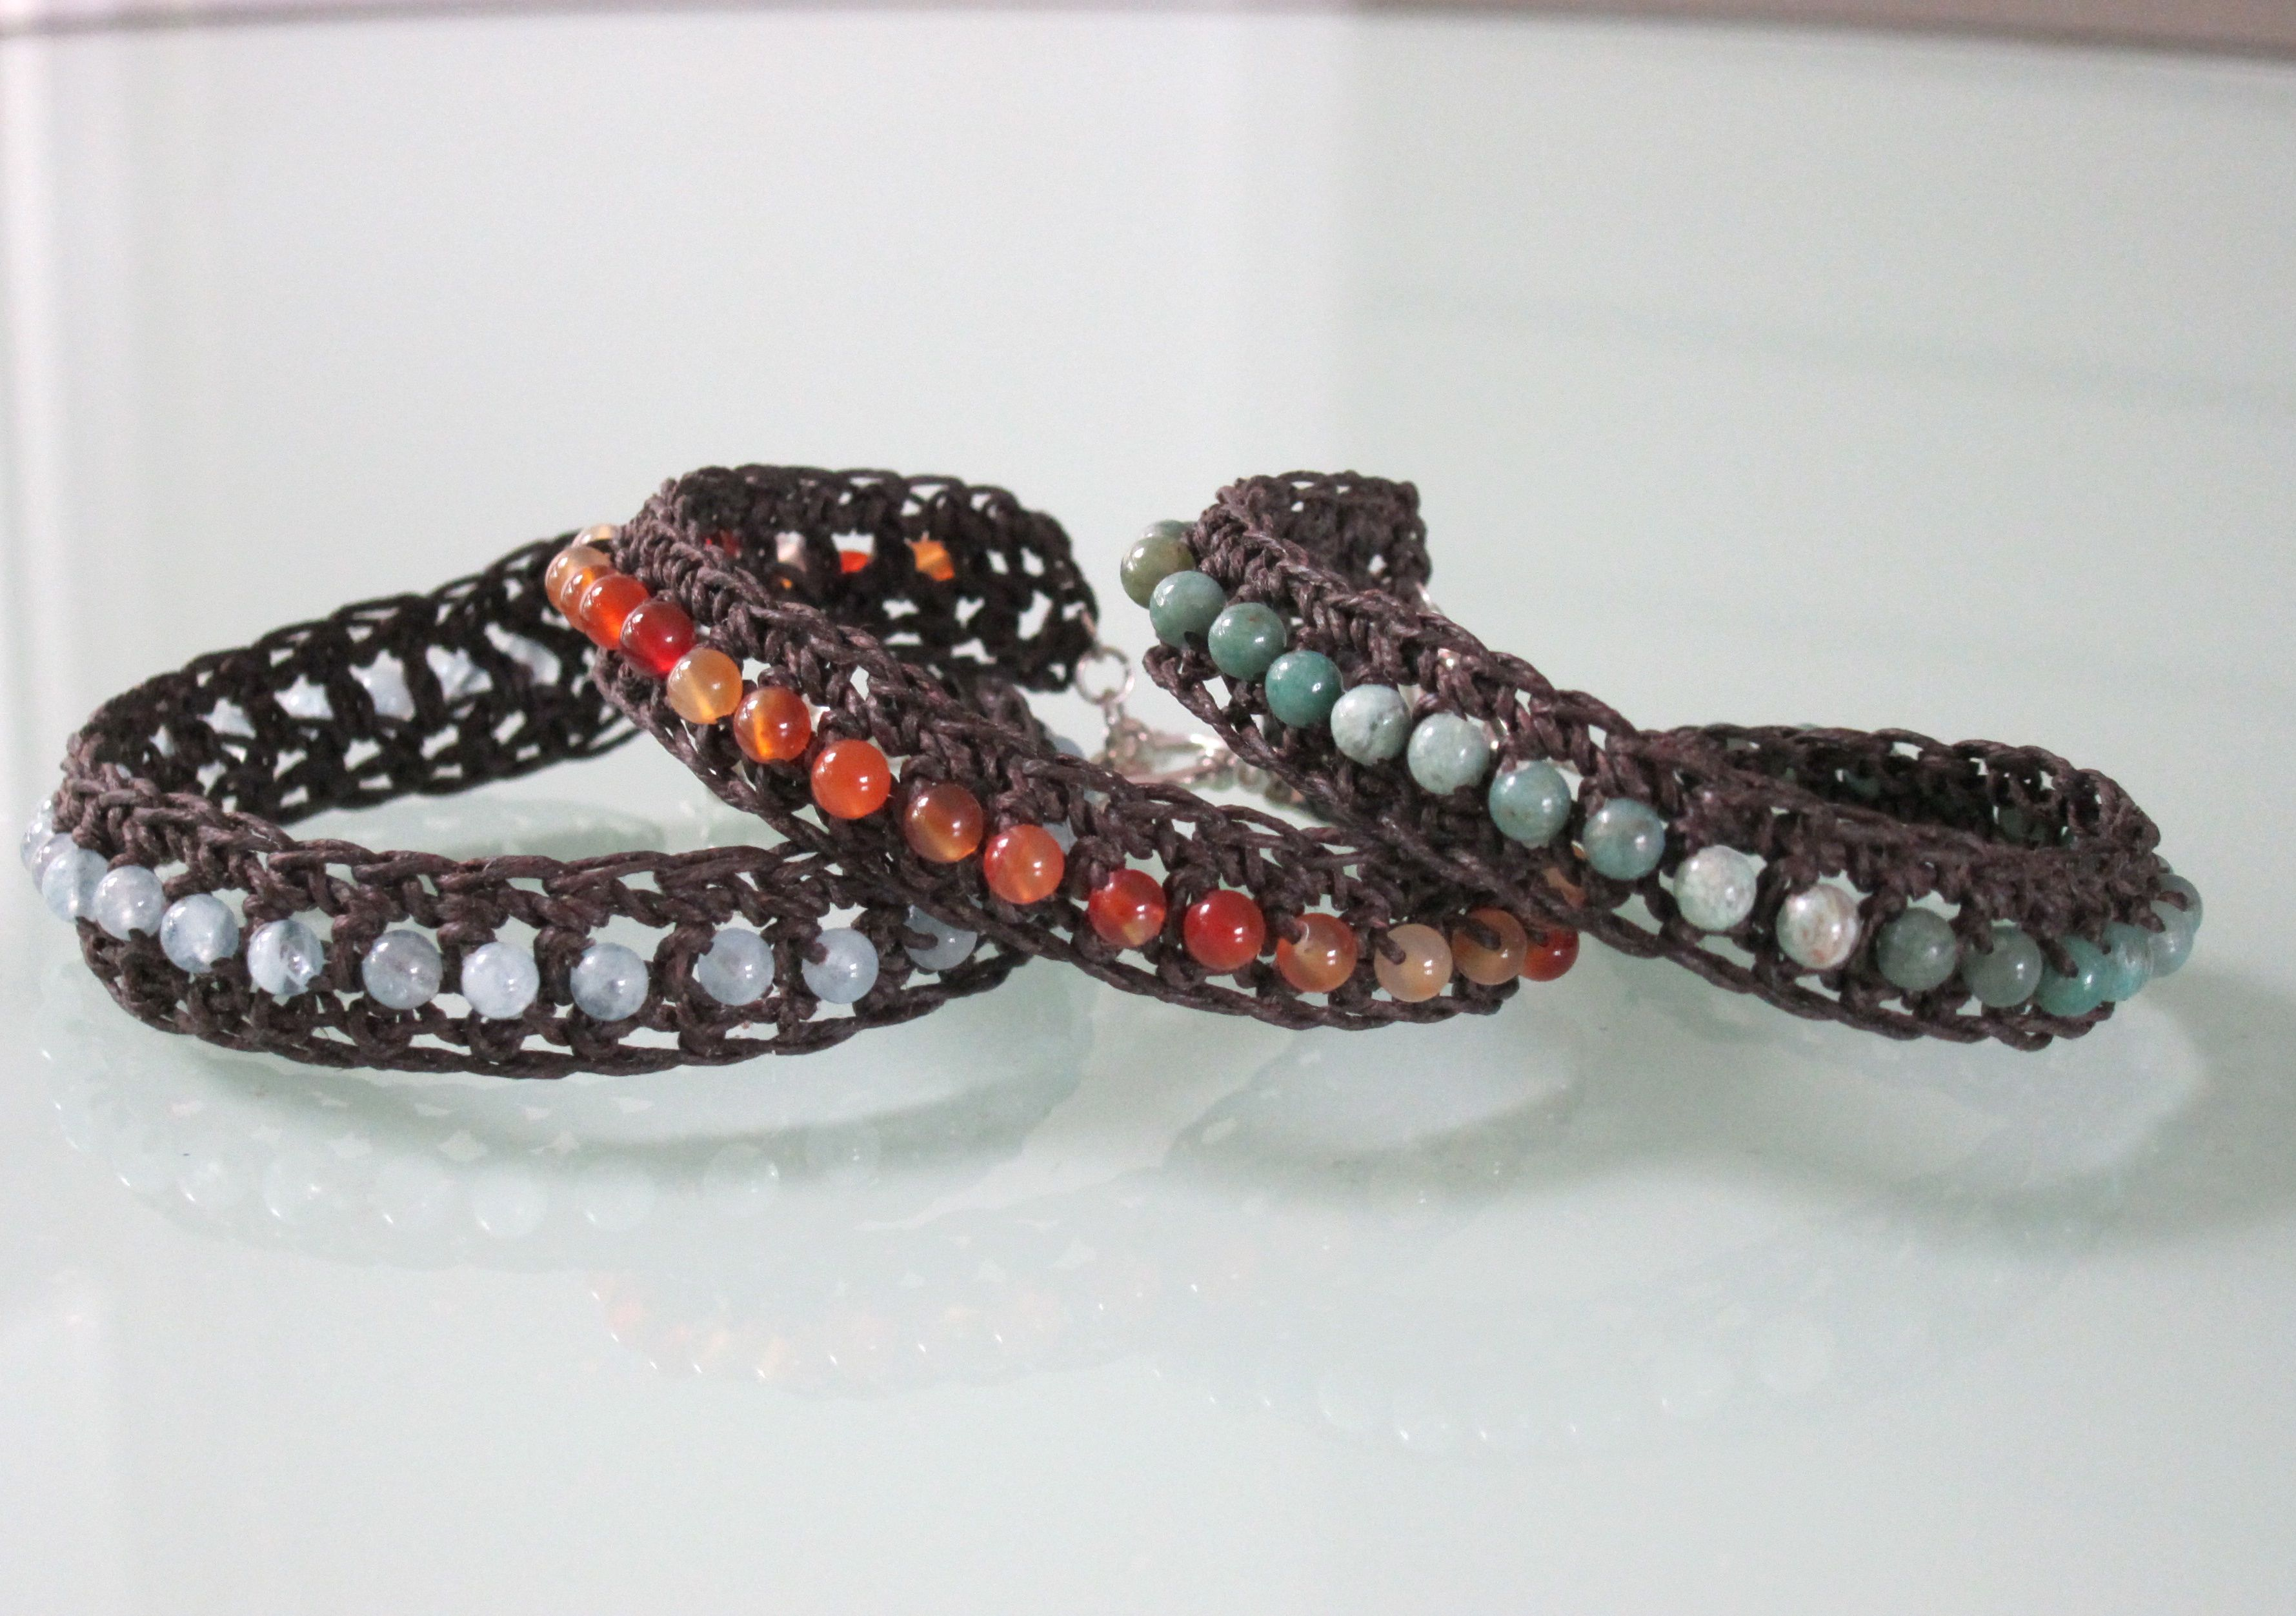 Skm Artworks Unique Handmade Jewelry Appeals To Wide